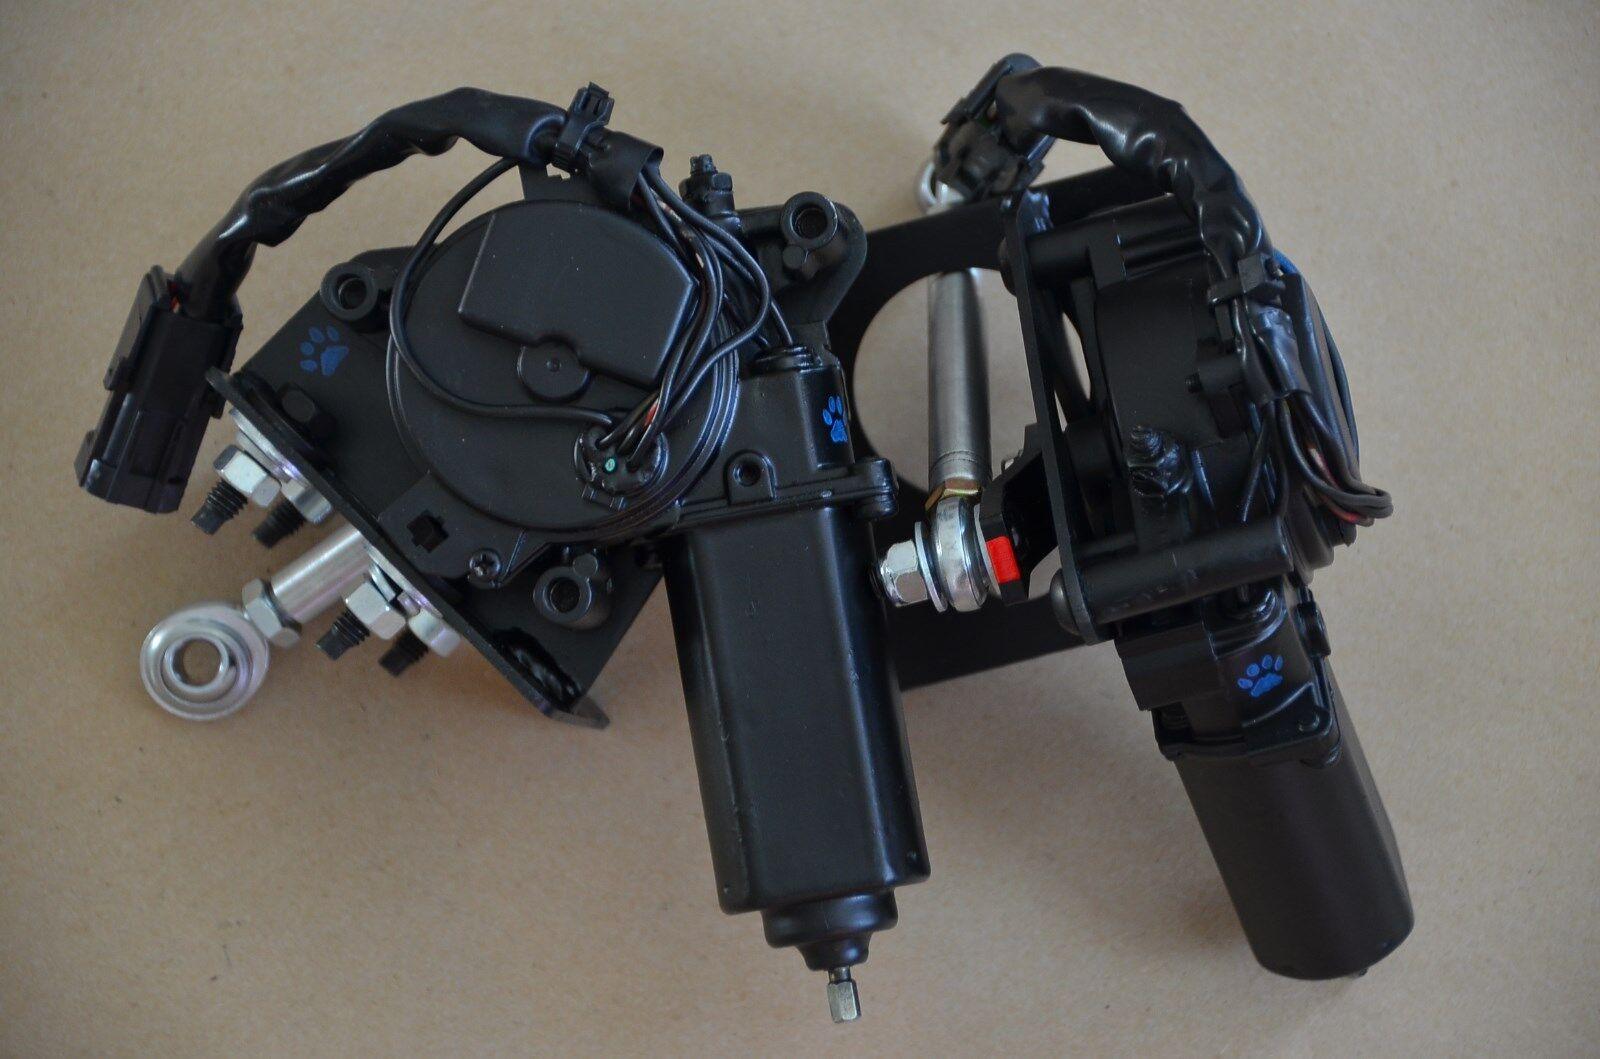 C3 Corvette Wiring Harness Conversion Speaker Wire 68 82 Electric Headlight Motor Kit 3 On